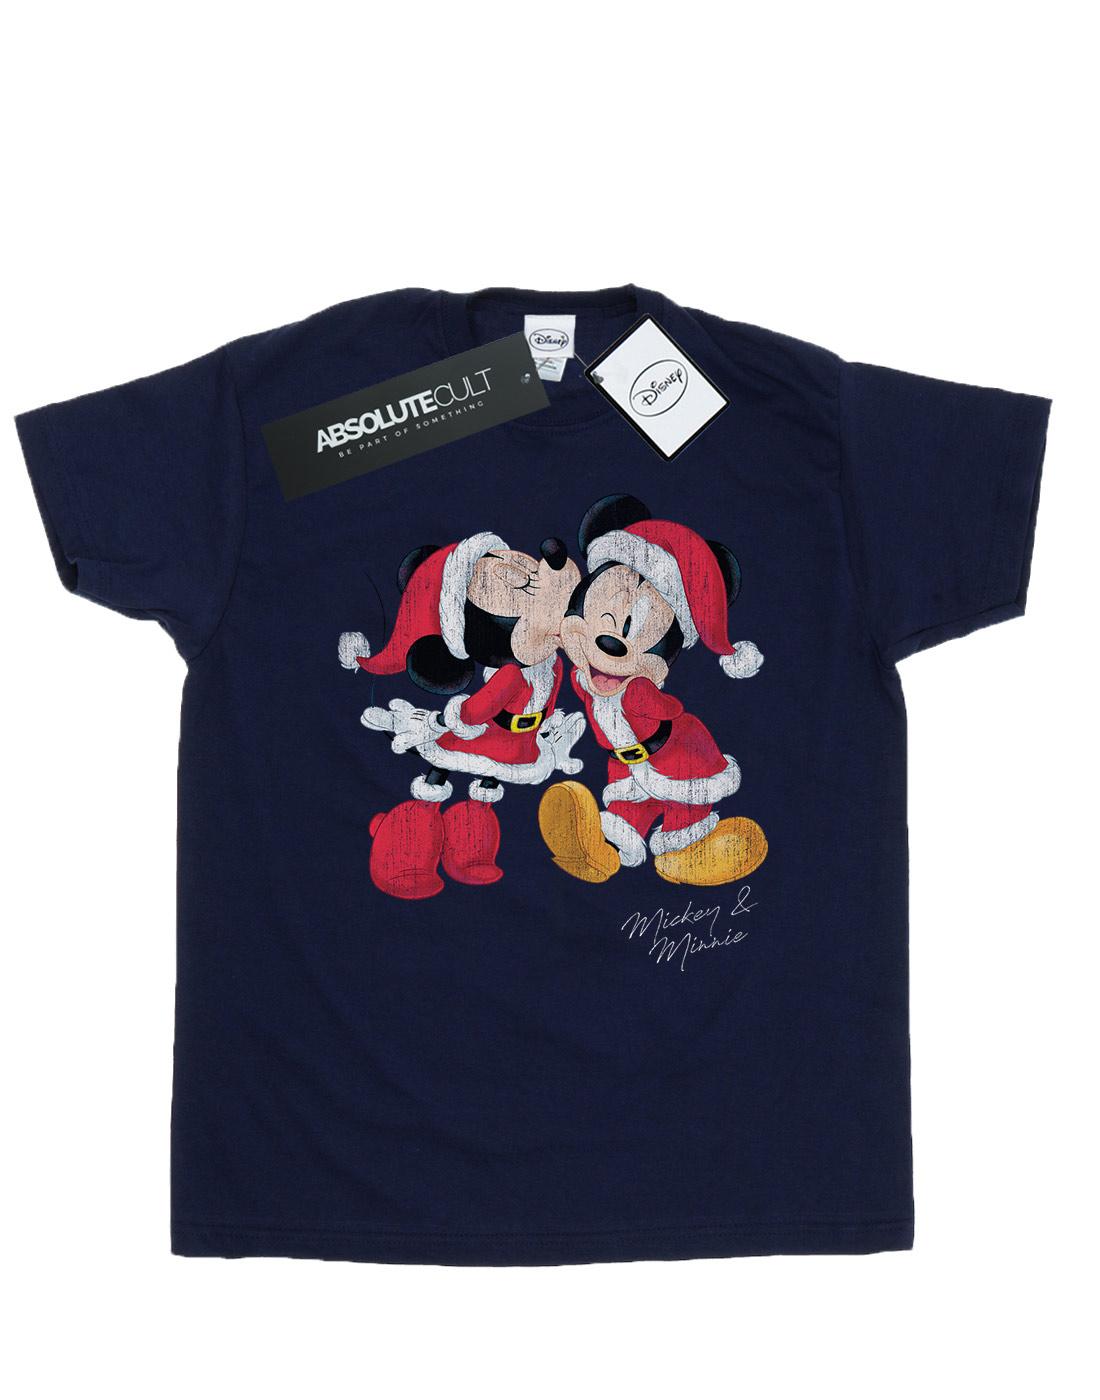 Disney-Women-039-s-Mickey-and-Minnie-Christmas-Kiss-Boyfriend-Fit-T-Shirt